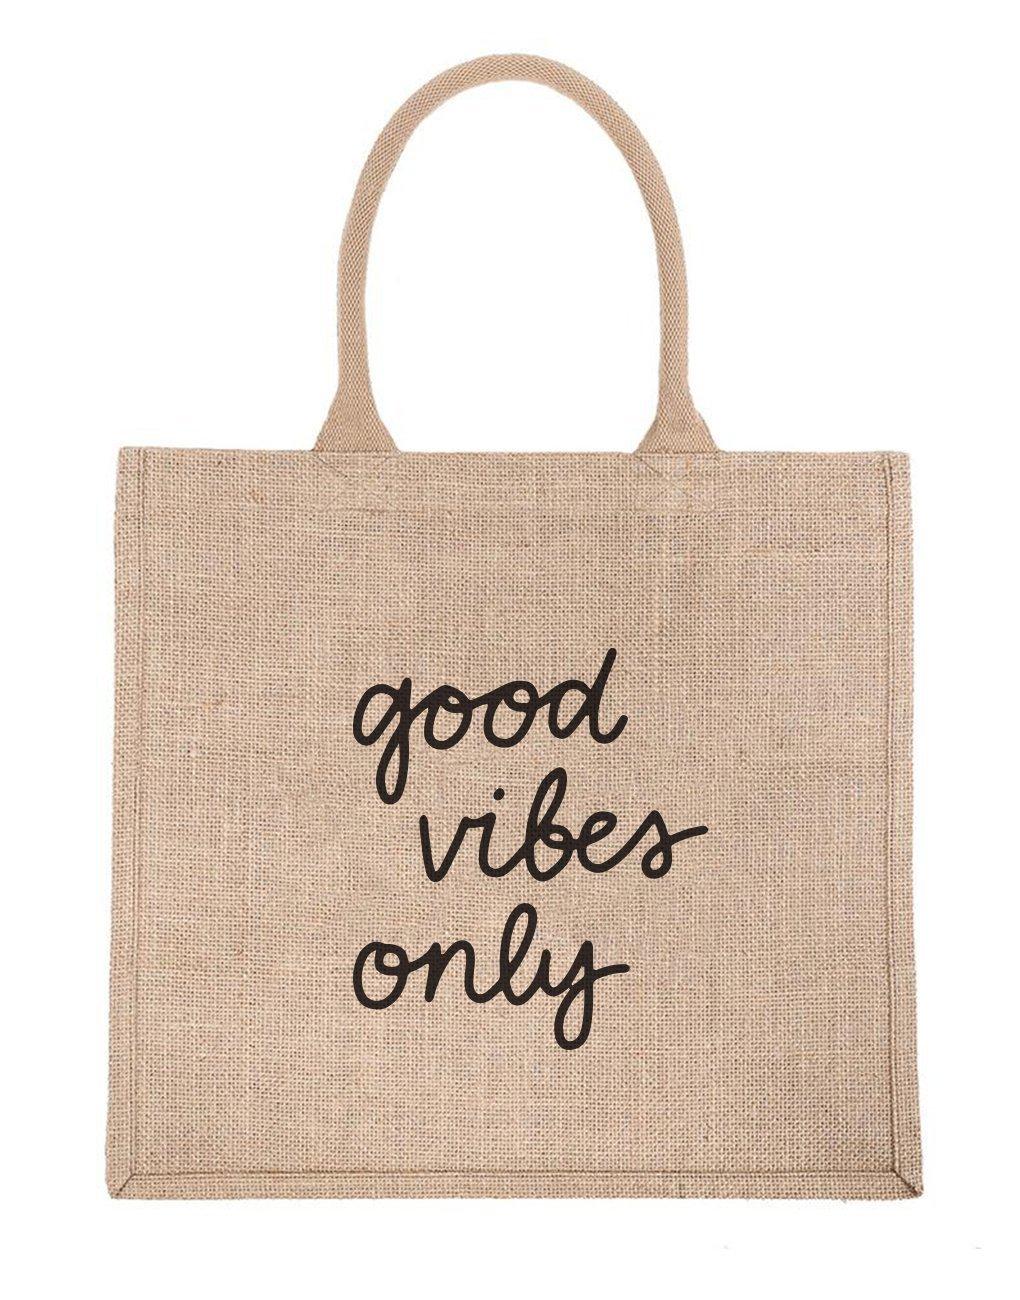 Good-Vibes-Only-Large-Reusable-Shopping-Bag-Black---The-Little-Market.jpg